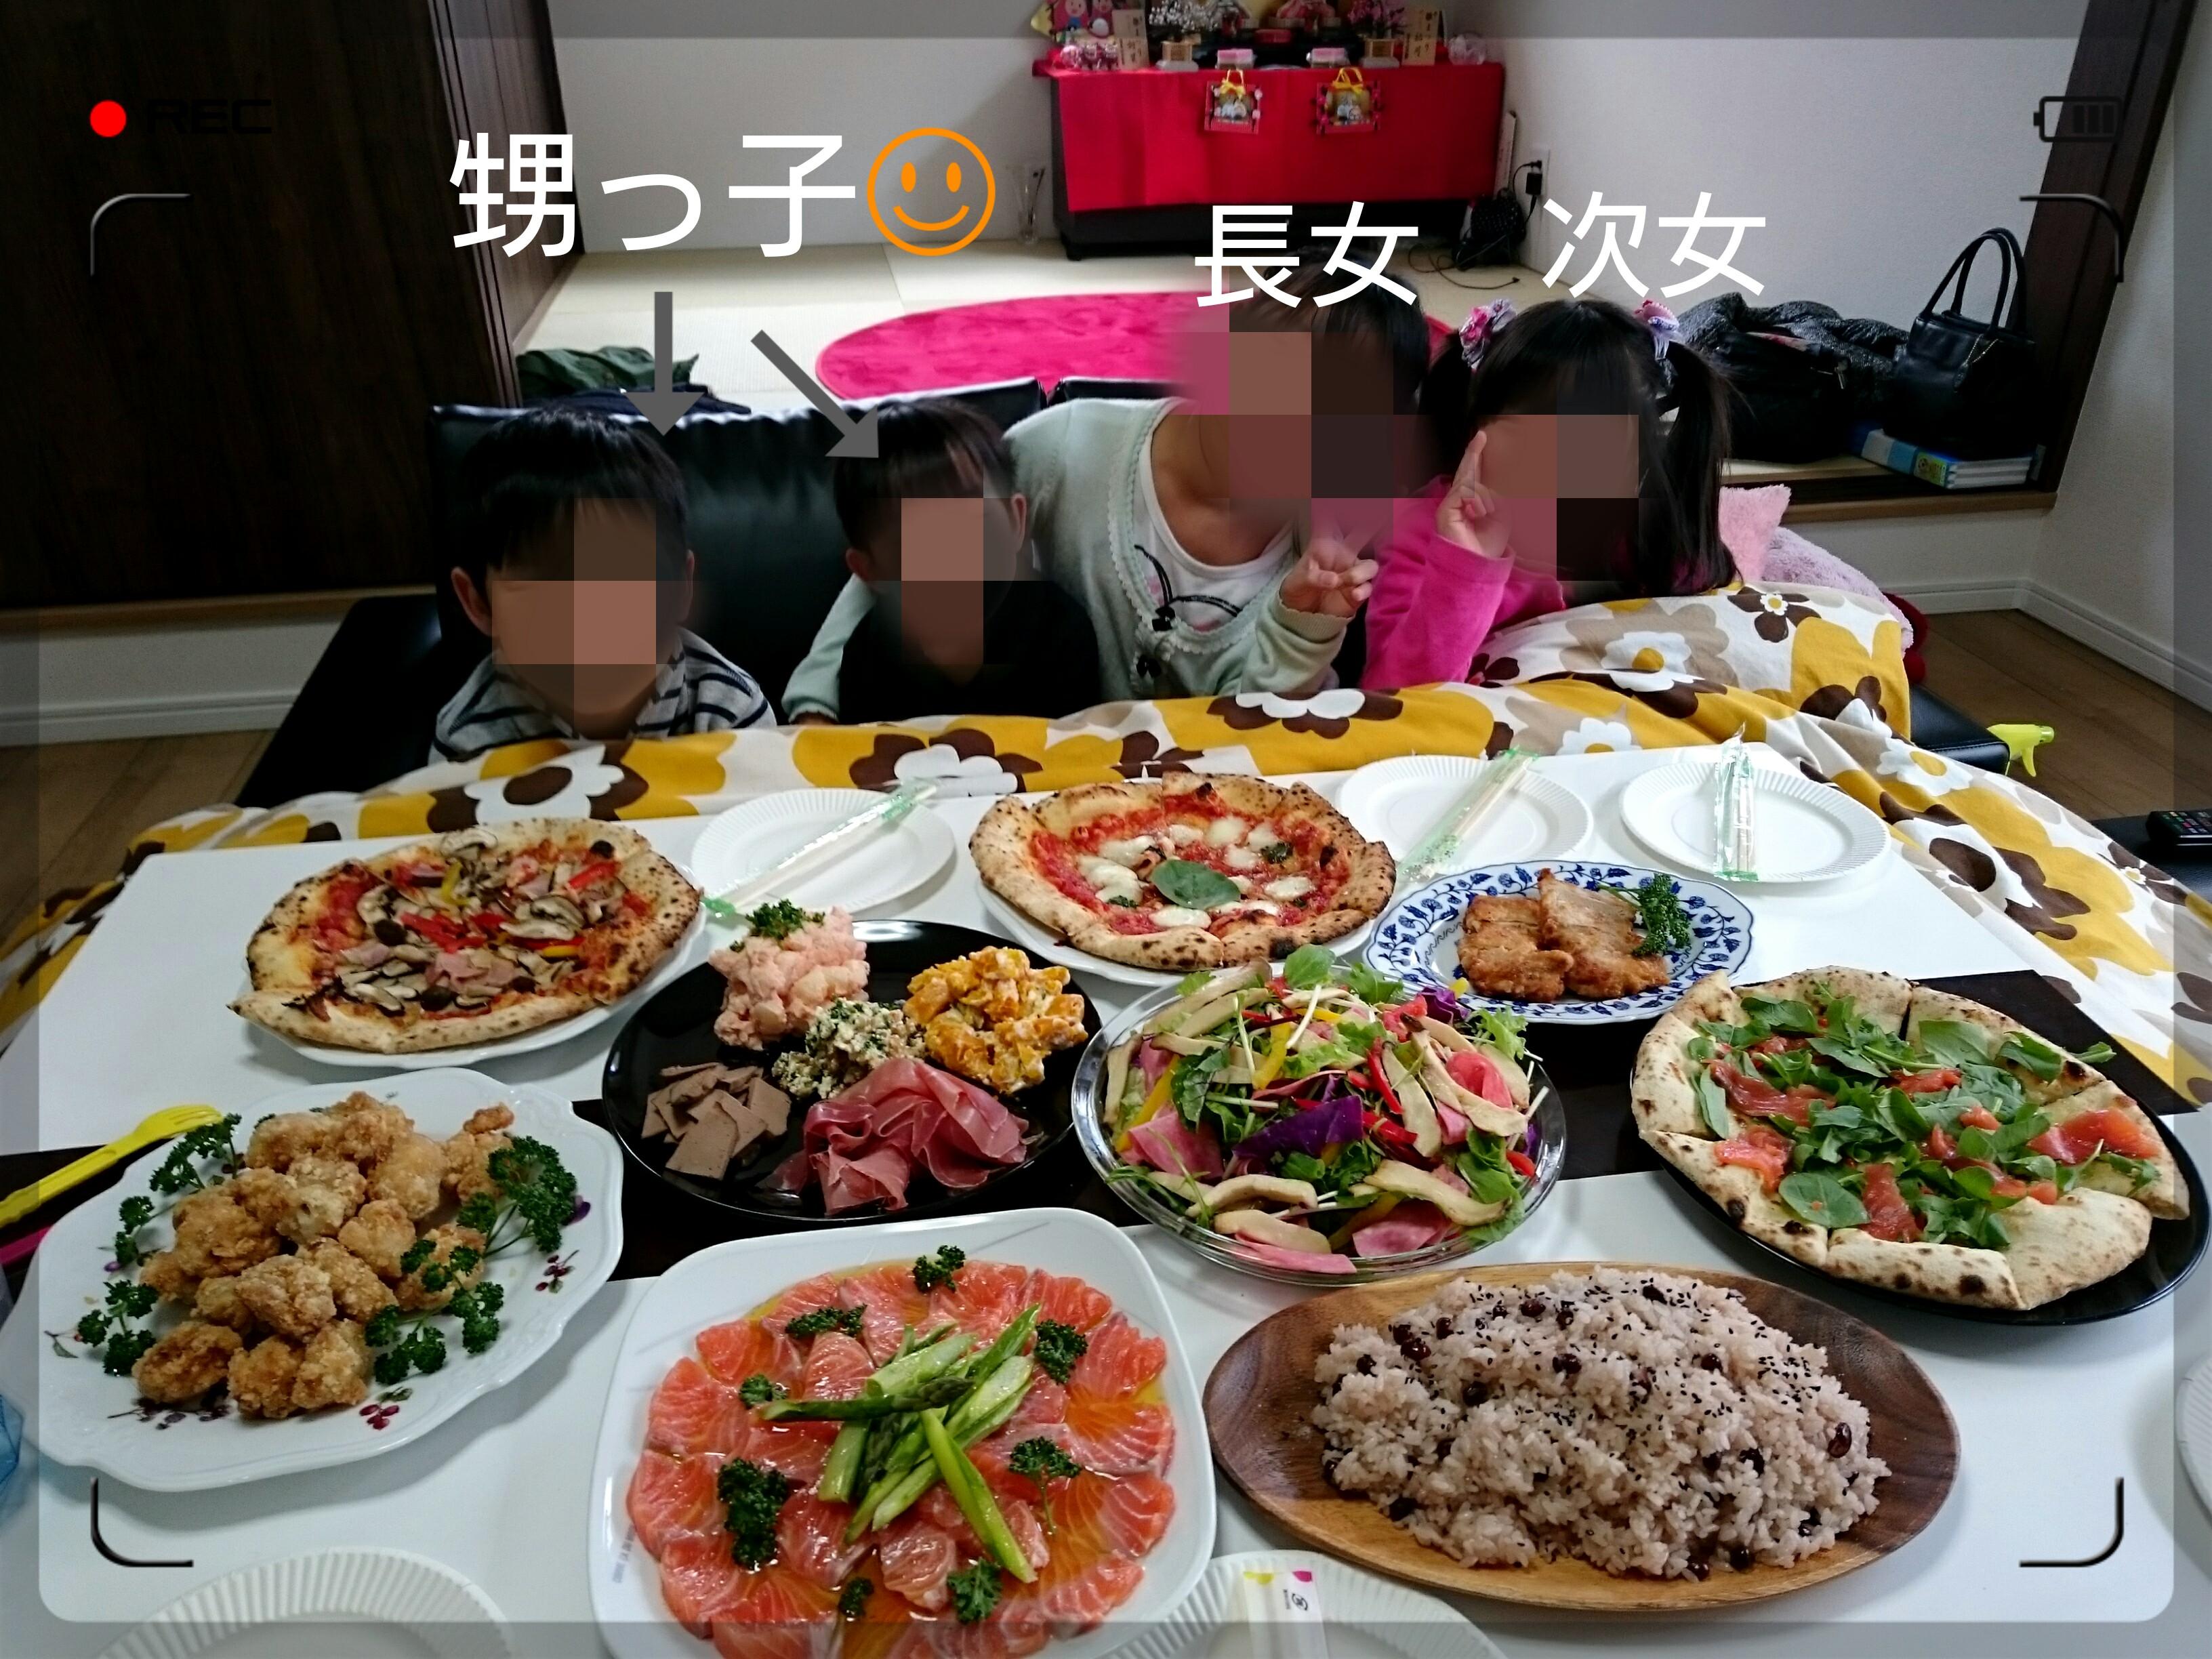 moblog_58ec5ab2.jpg